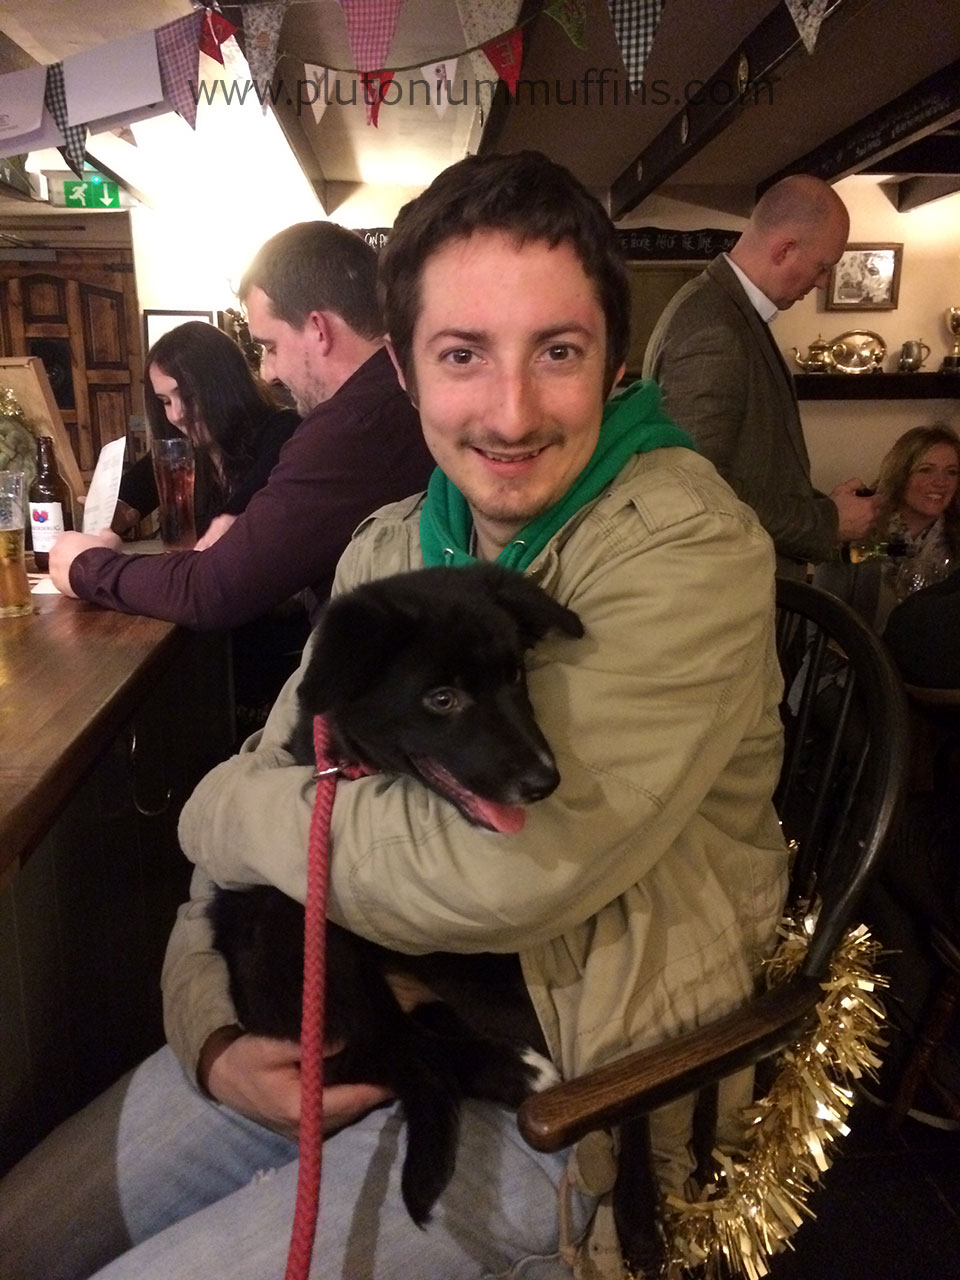 Enjoying John cuddles in the pub.